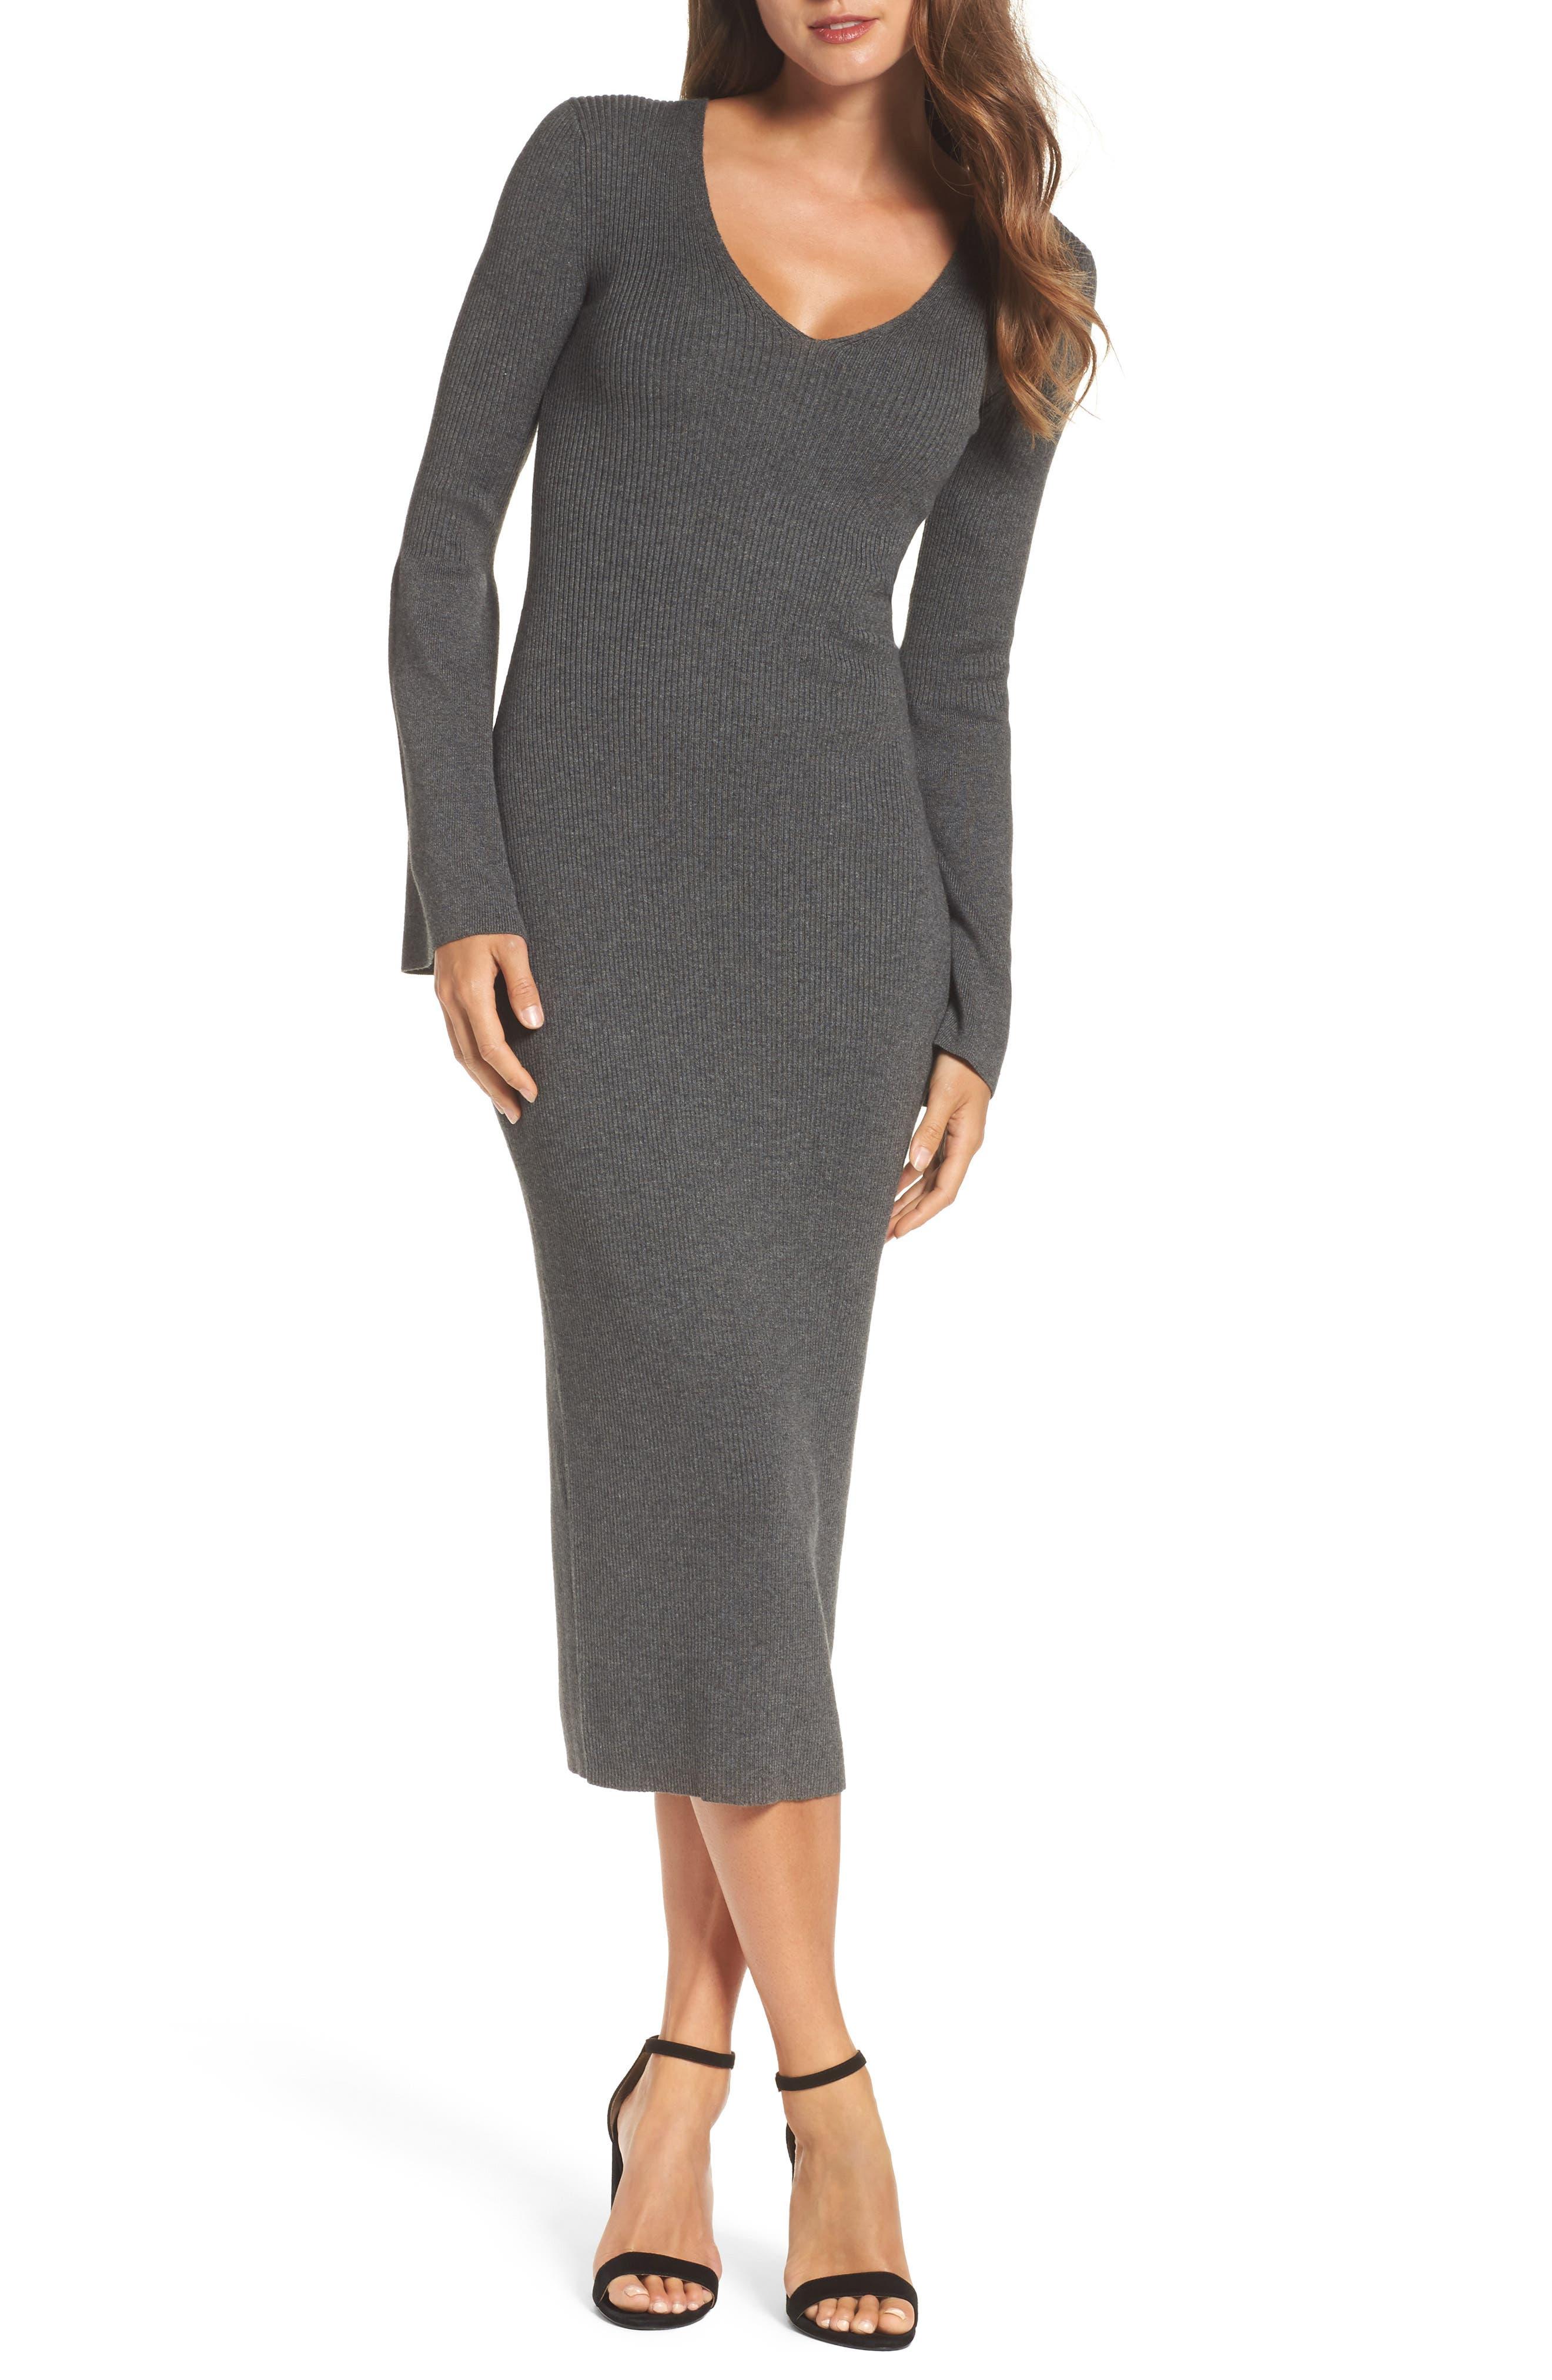 Virgie Knits Midi Dress,                         Main,                         color, Charcoal